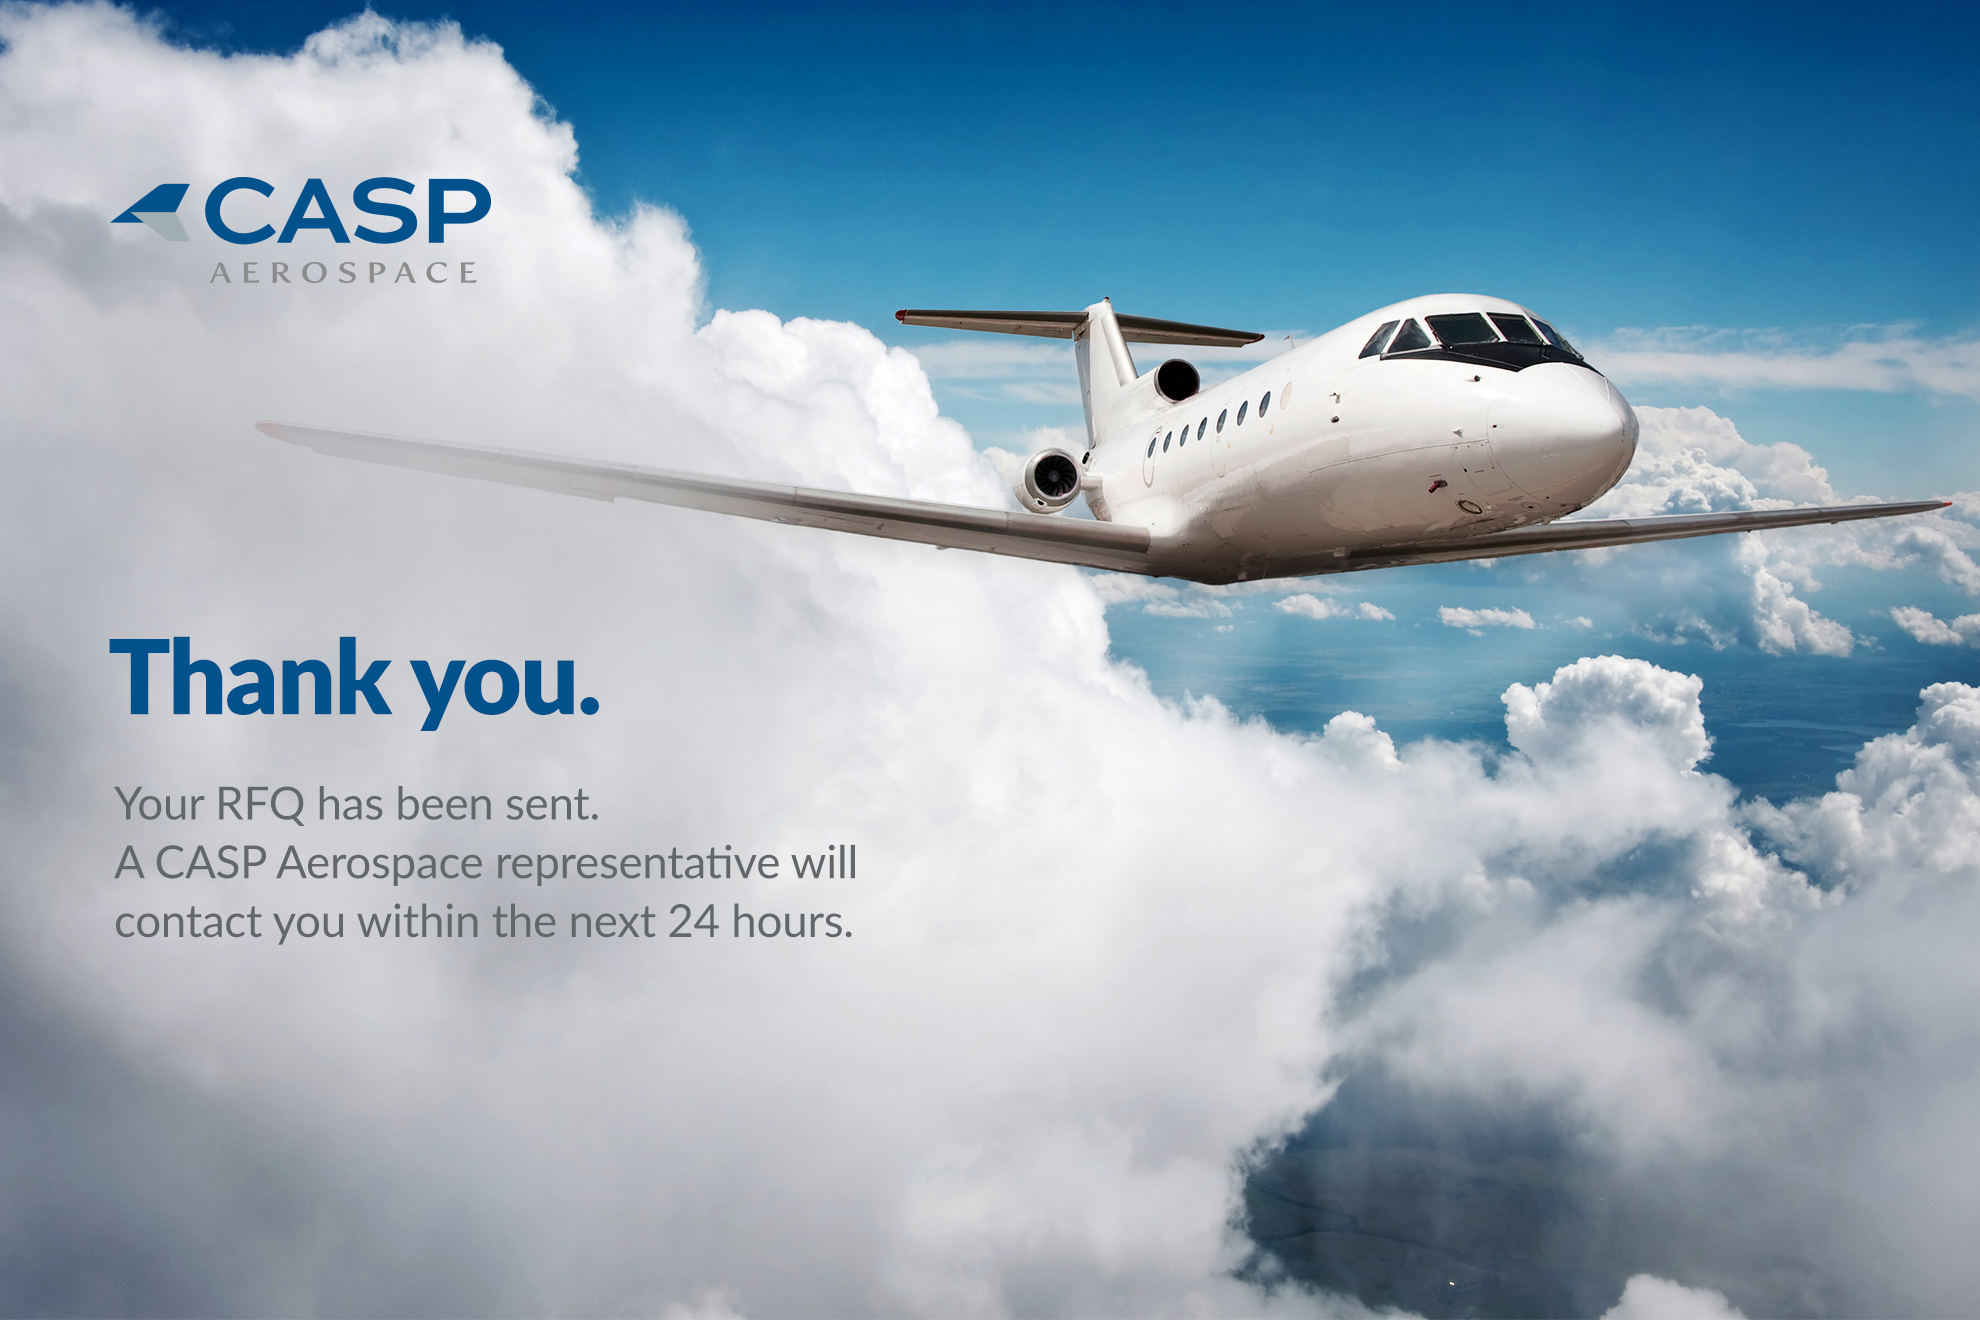 CASP Aerospace - Thank you message for RFQ.